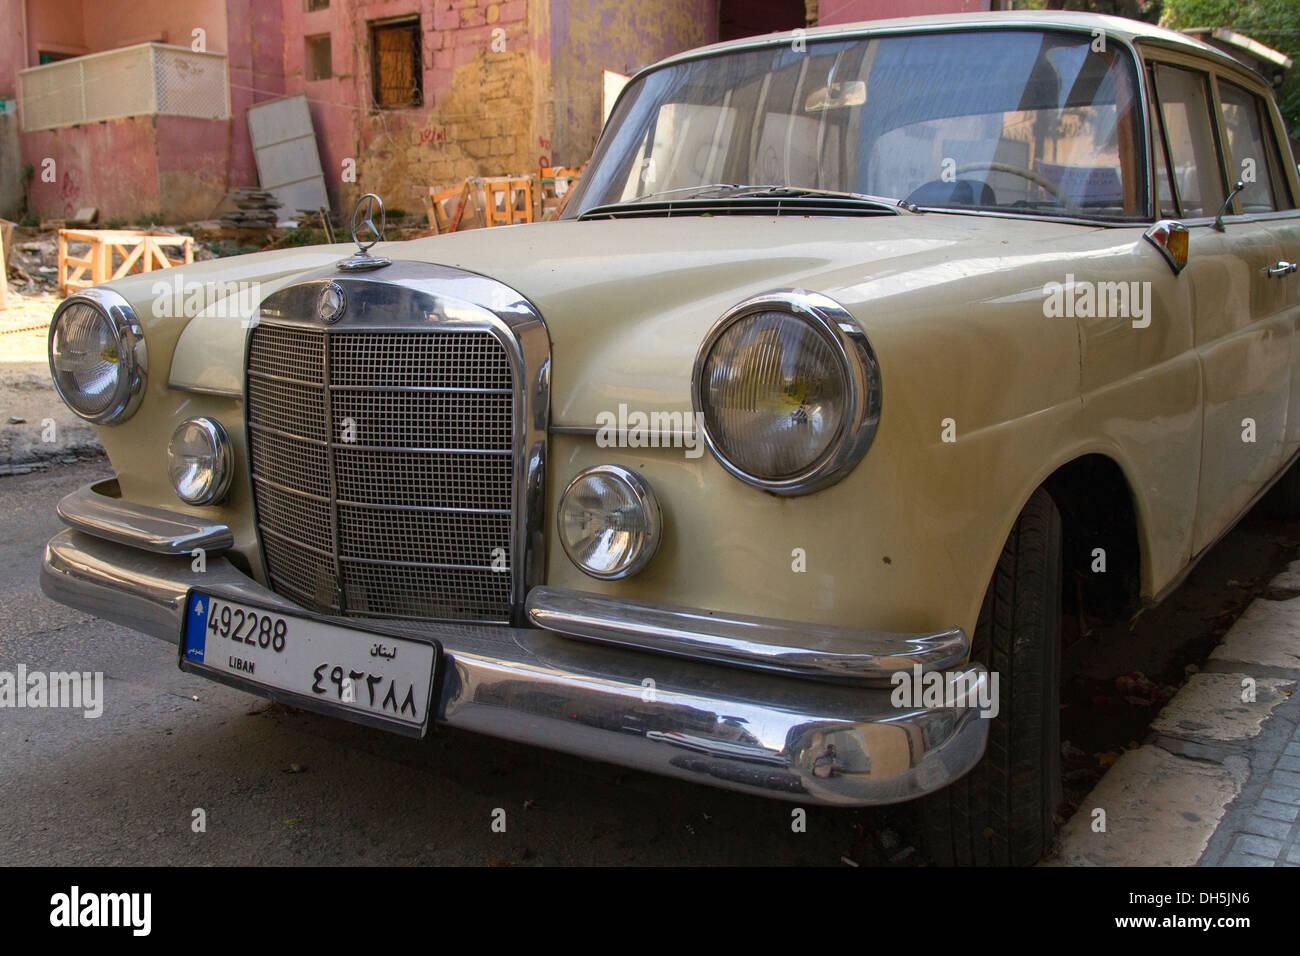 Vintage mercedes benz beirut lebanon stock photo for Mercedes benz lebanon